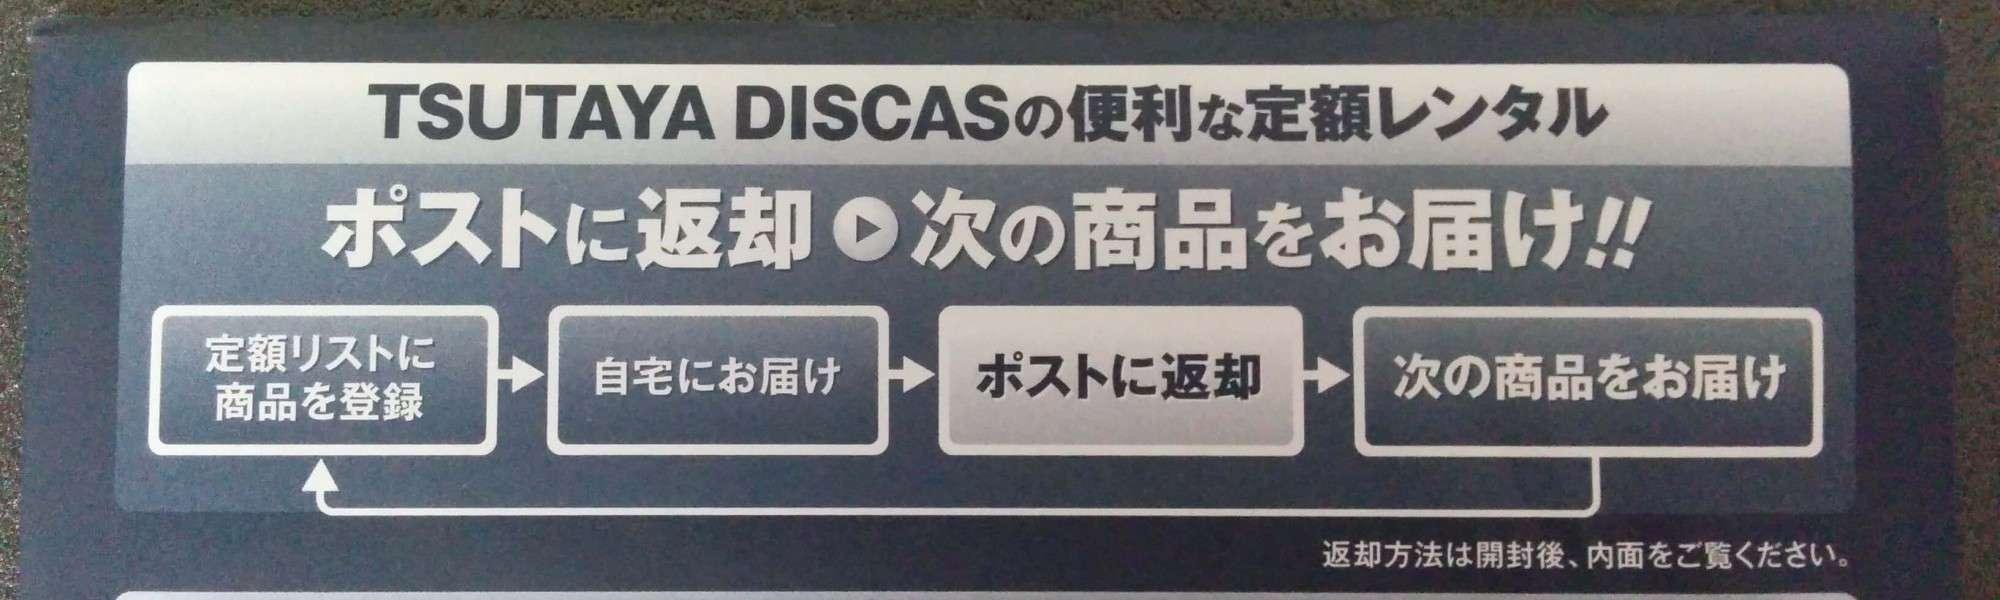 TSUTAYA _DISCAS 定額レンタル